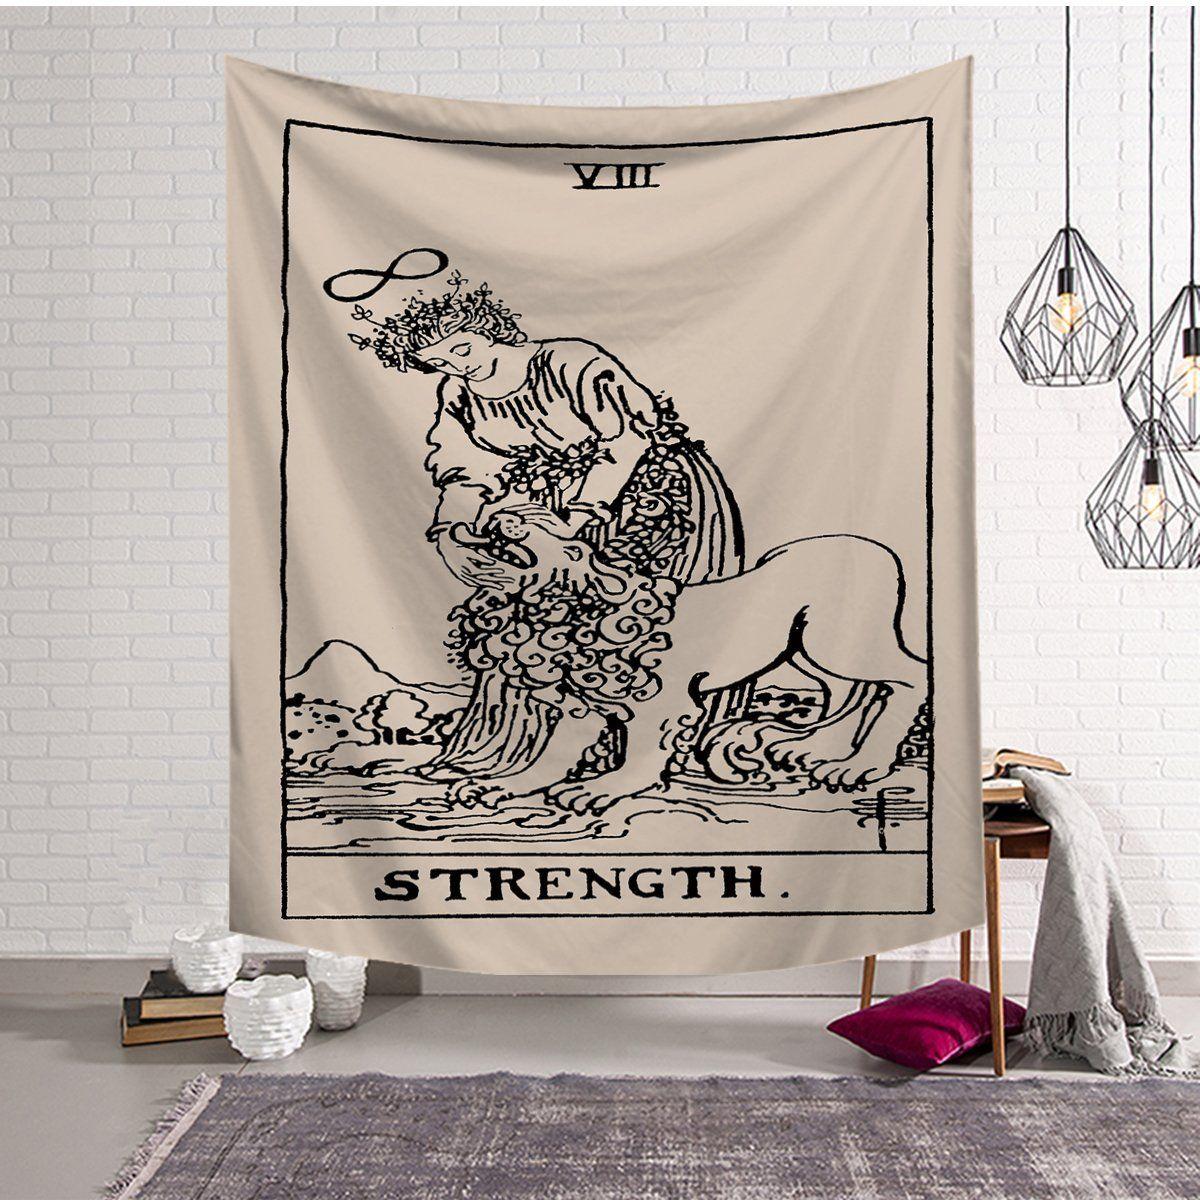 Strength tarot card tapestry altar cloth dorm